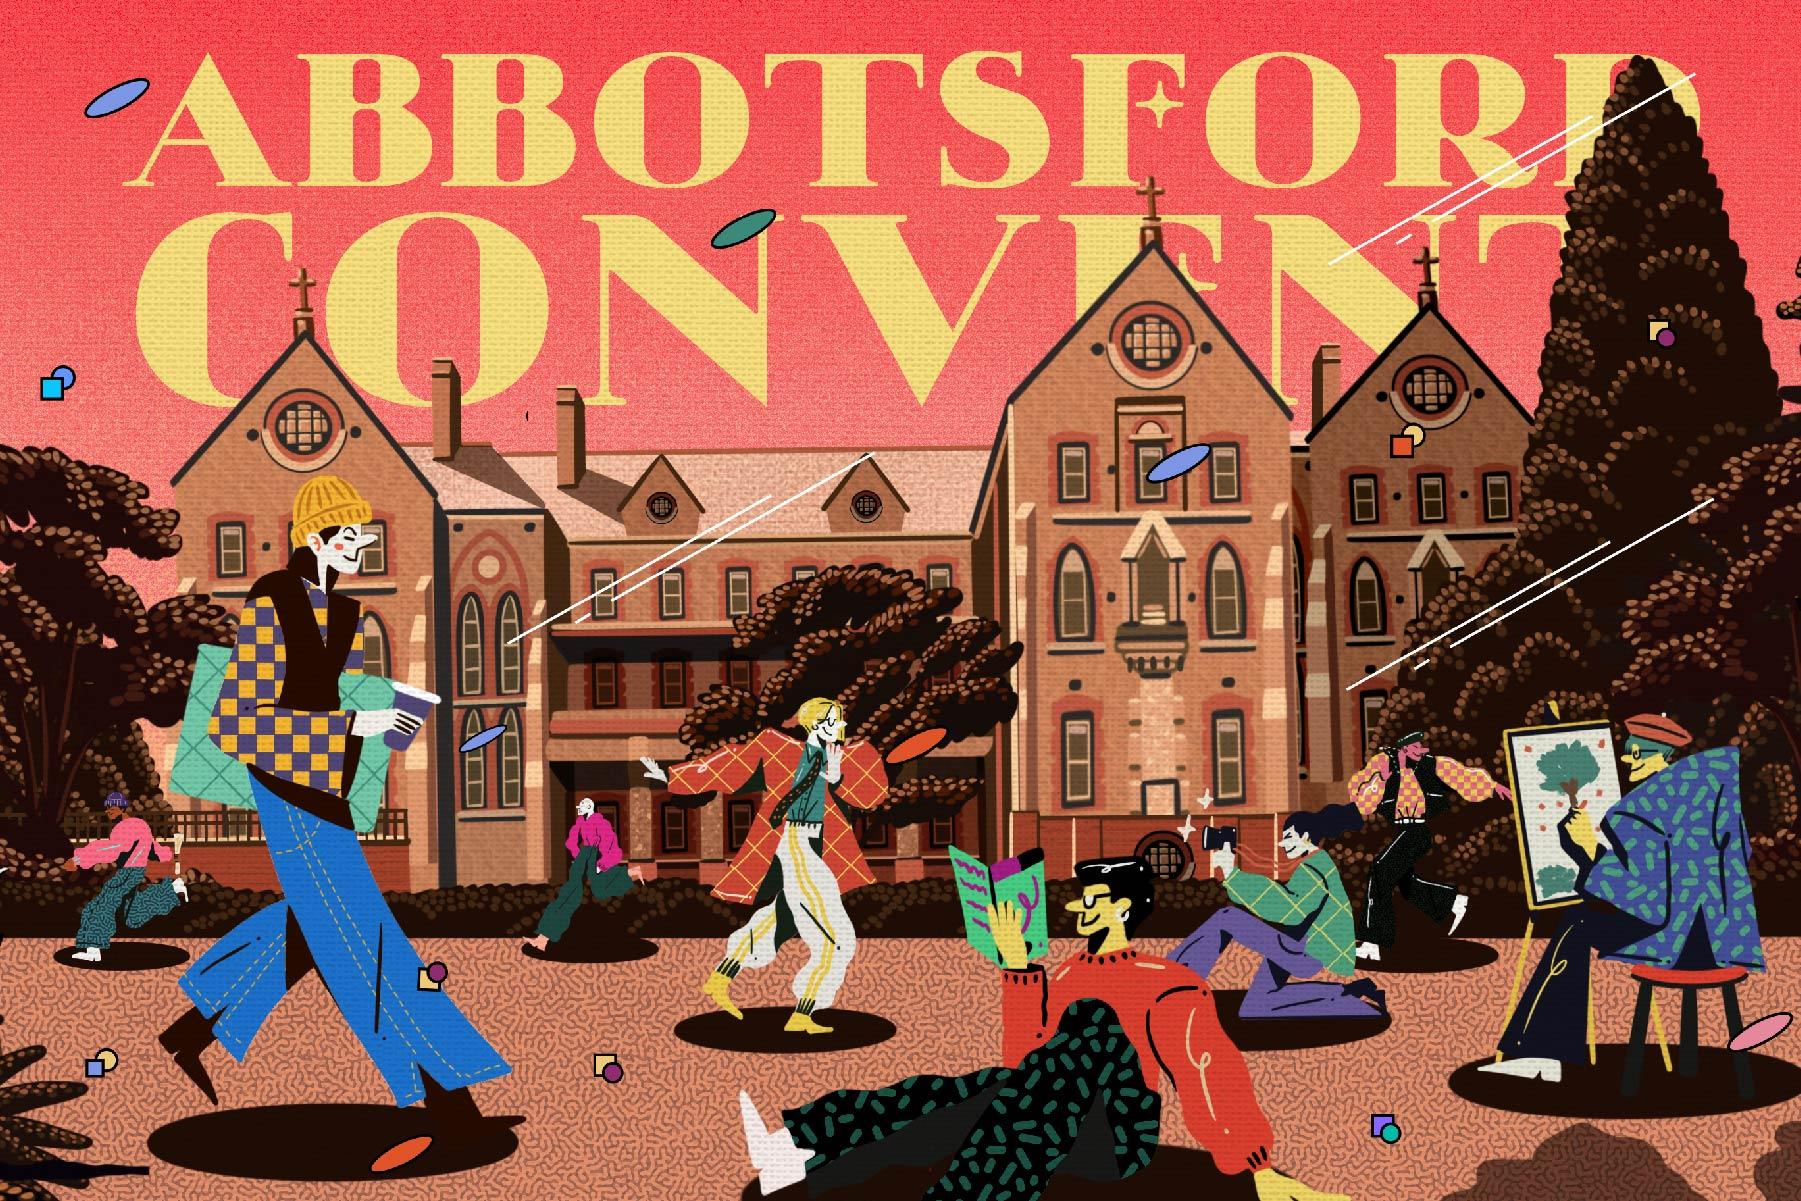 Abbotsford Convent เมื่อชาวเมืองร่วมกันพลิกสำนักชีเก่าเป็น creative space ที่ตรงใจ